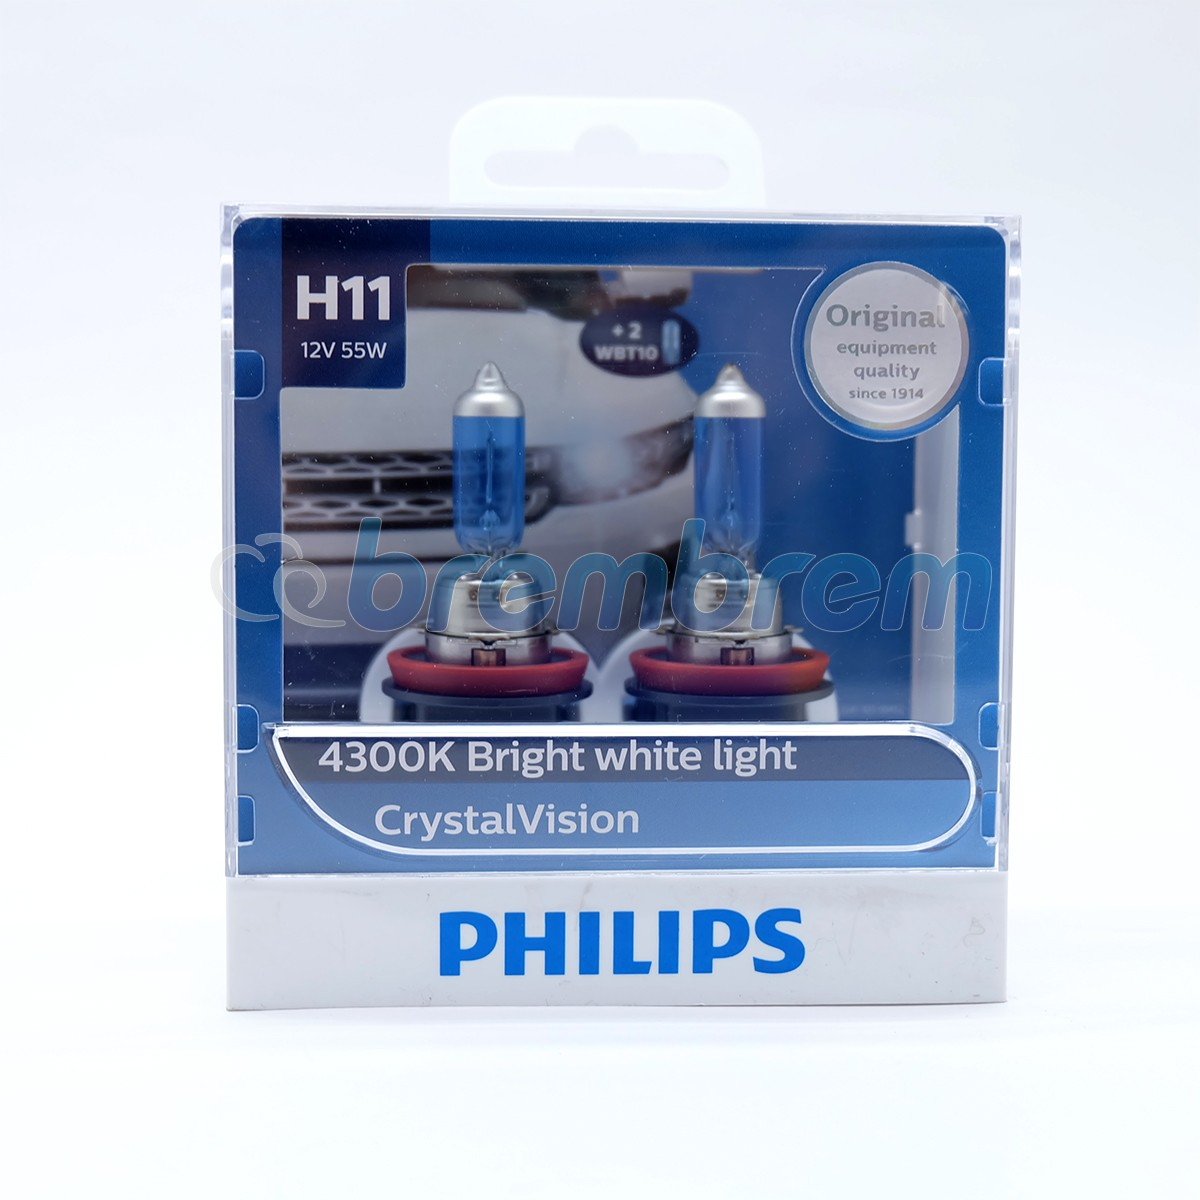 PHILIPS CRYSTAL VISION H11 (4300K) - LAMPU HALOGEN